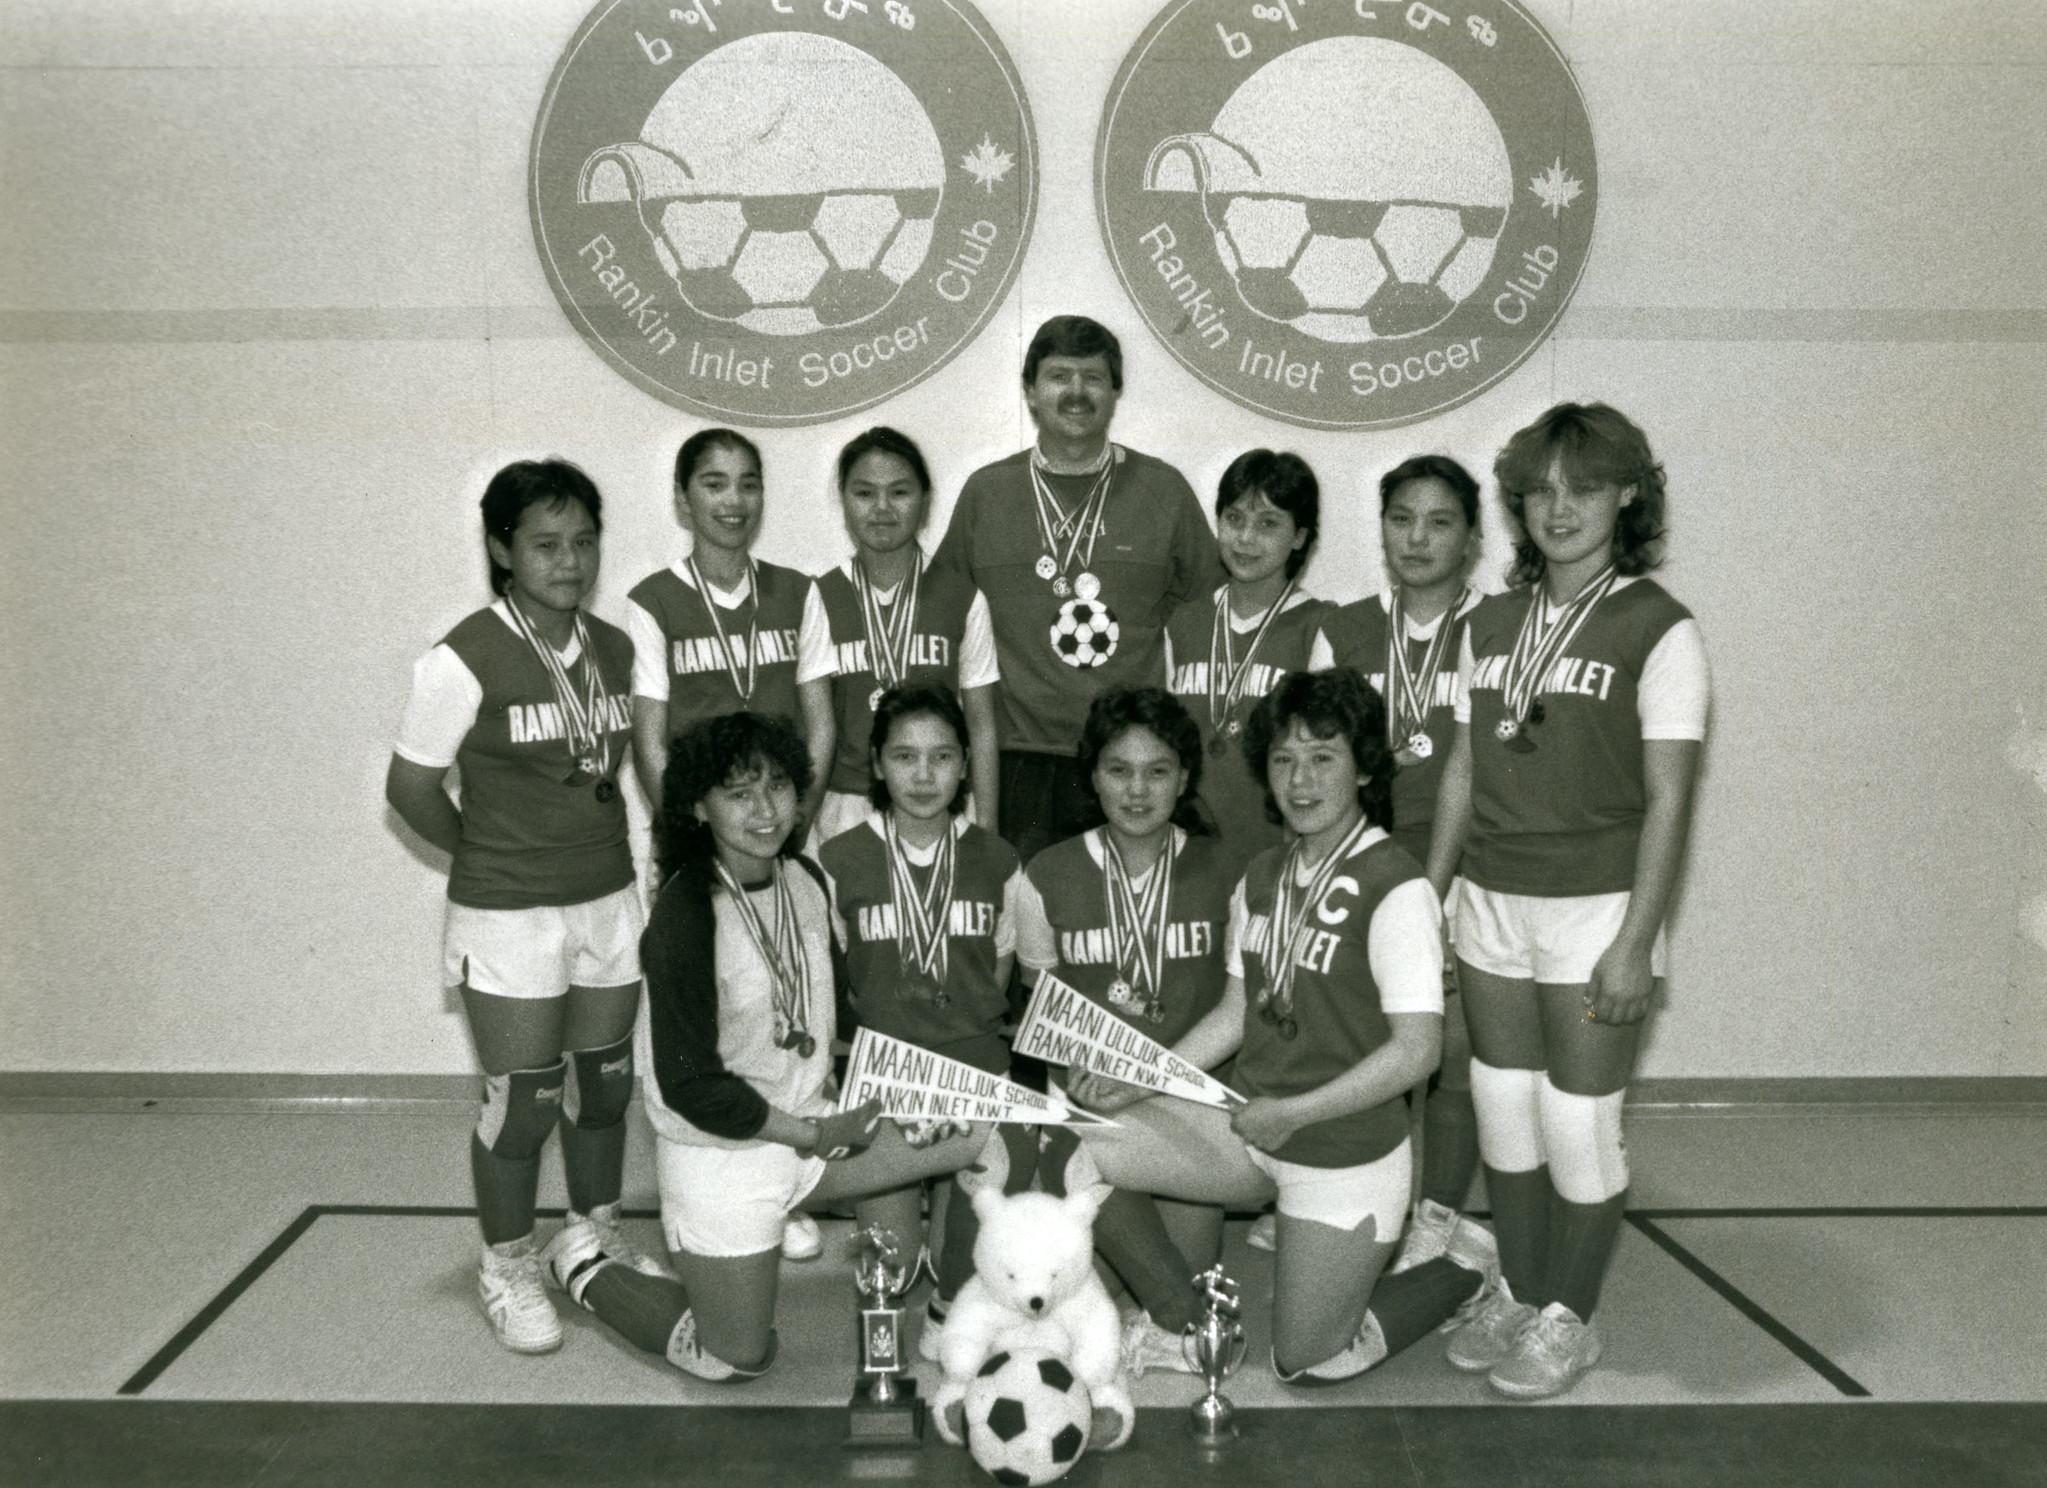 Maani Ulujuk Ilinniarvik soccer team from Rankin Inlet. (Canada Soccer)